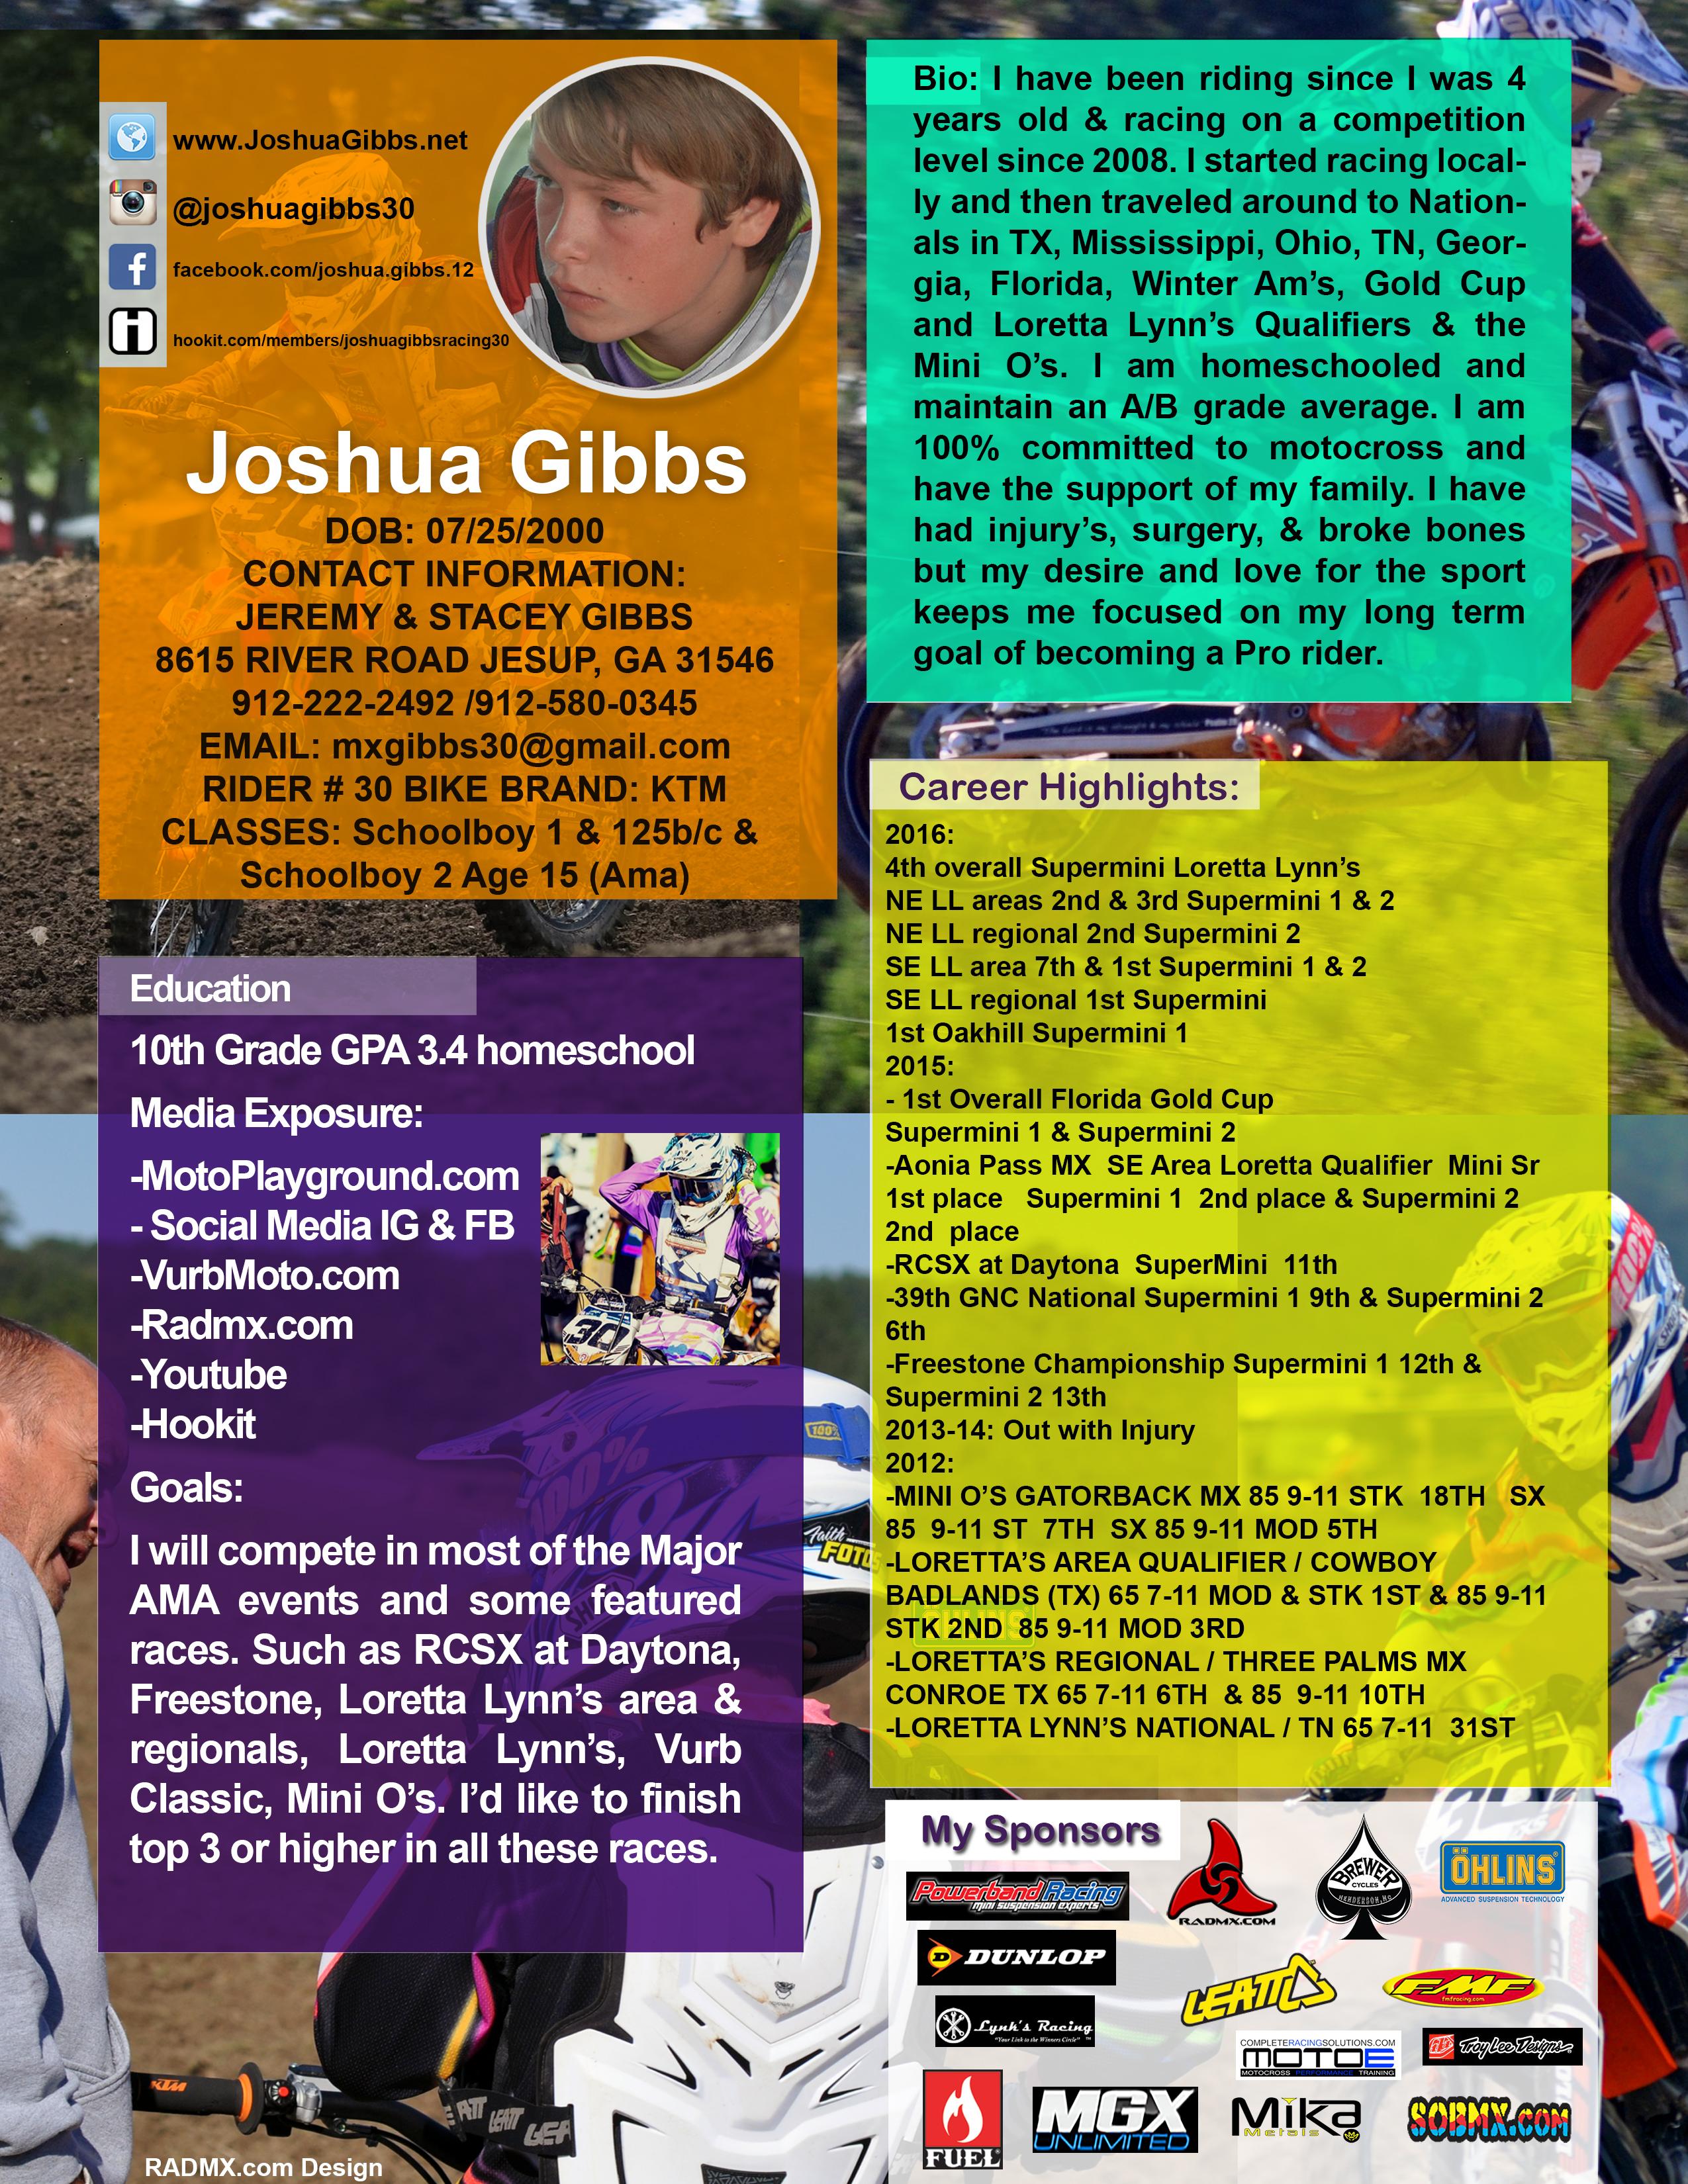 Joshua Gibbs 2017 Resume